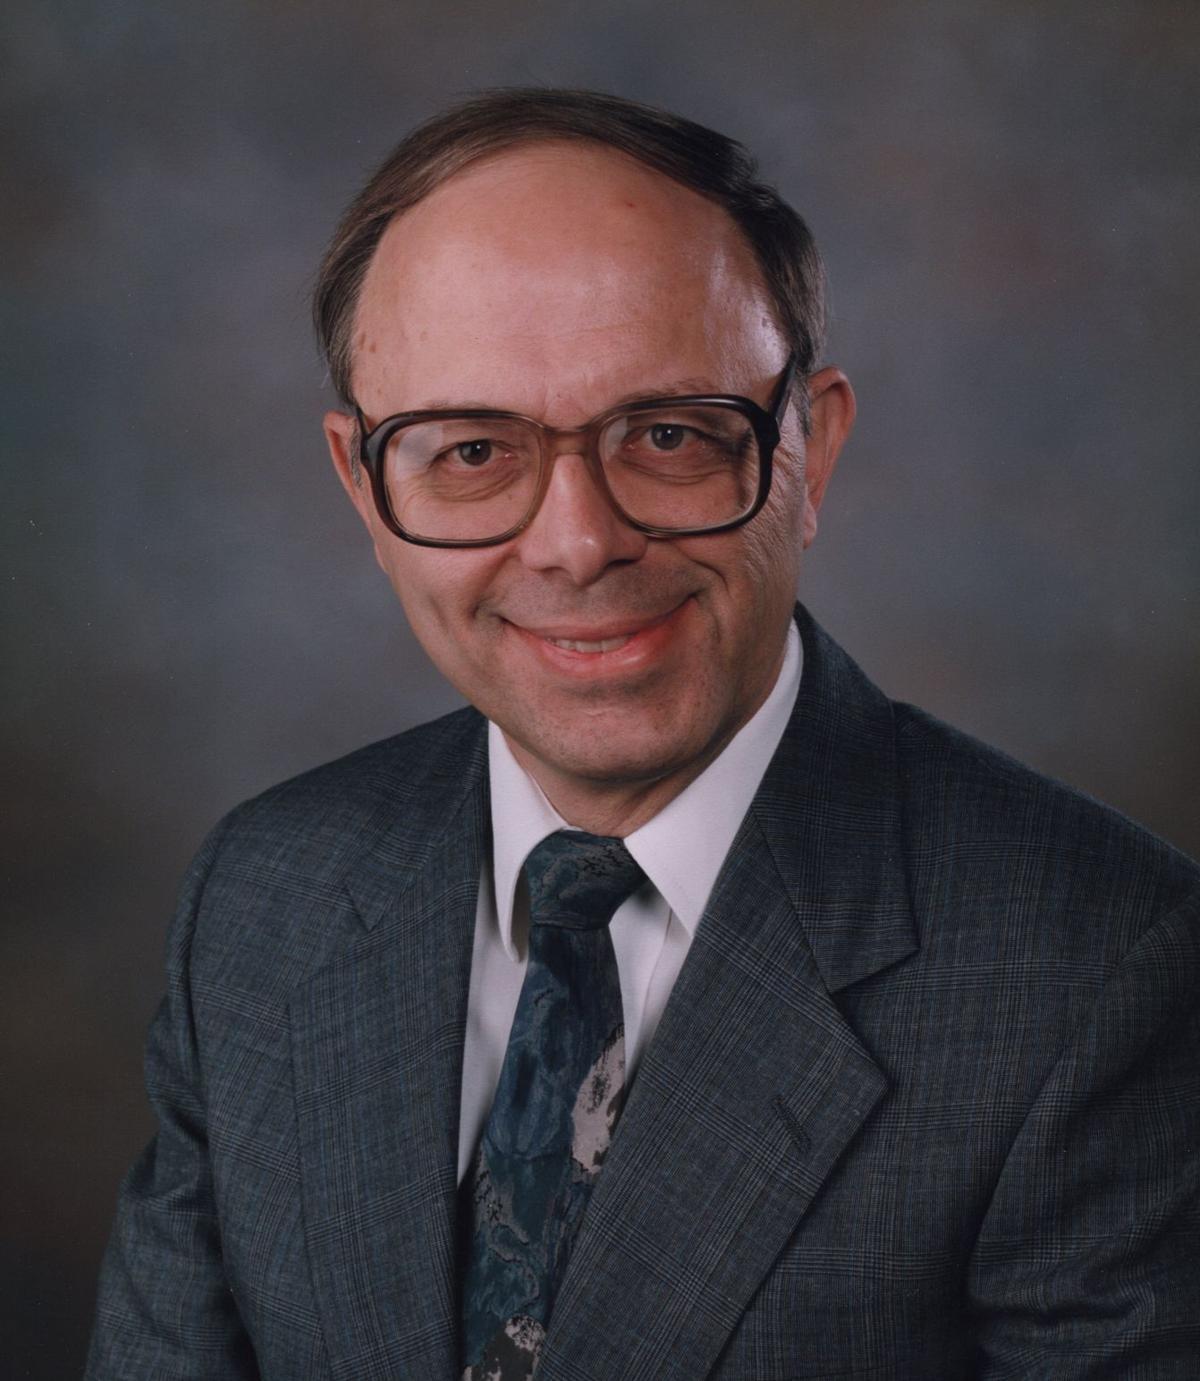 Bob Brady Decatur Il >> Garwood, Douglas L. | Obituaries | herald-review.com